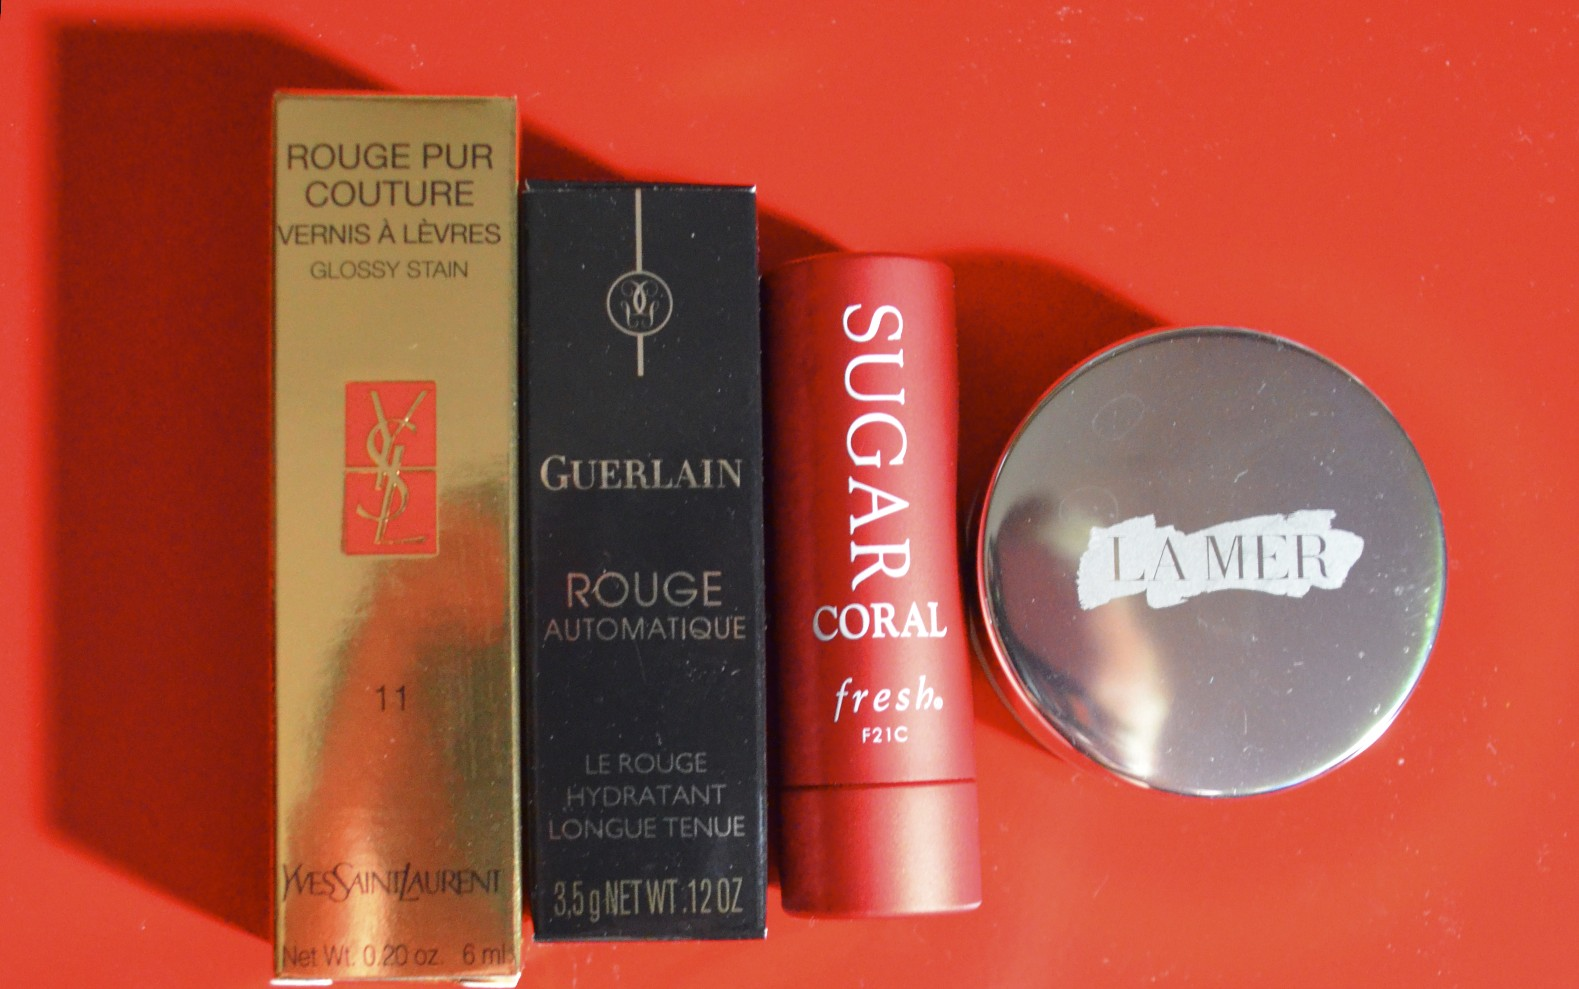 YSL Glossy Stain #11 Rouge Gouache, Guerlain Rouge Automatique 103, Fresh Sugar Coral Lip Treatment, La Mer Lip Balm